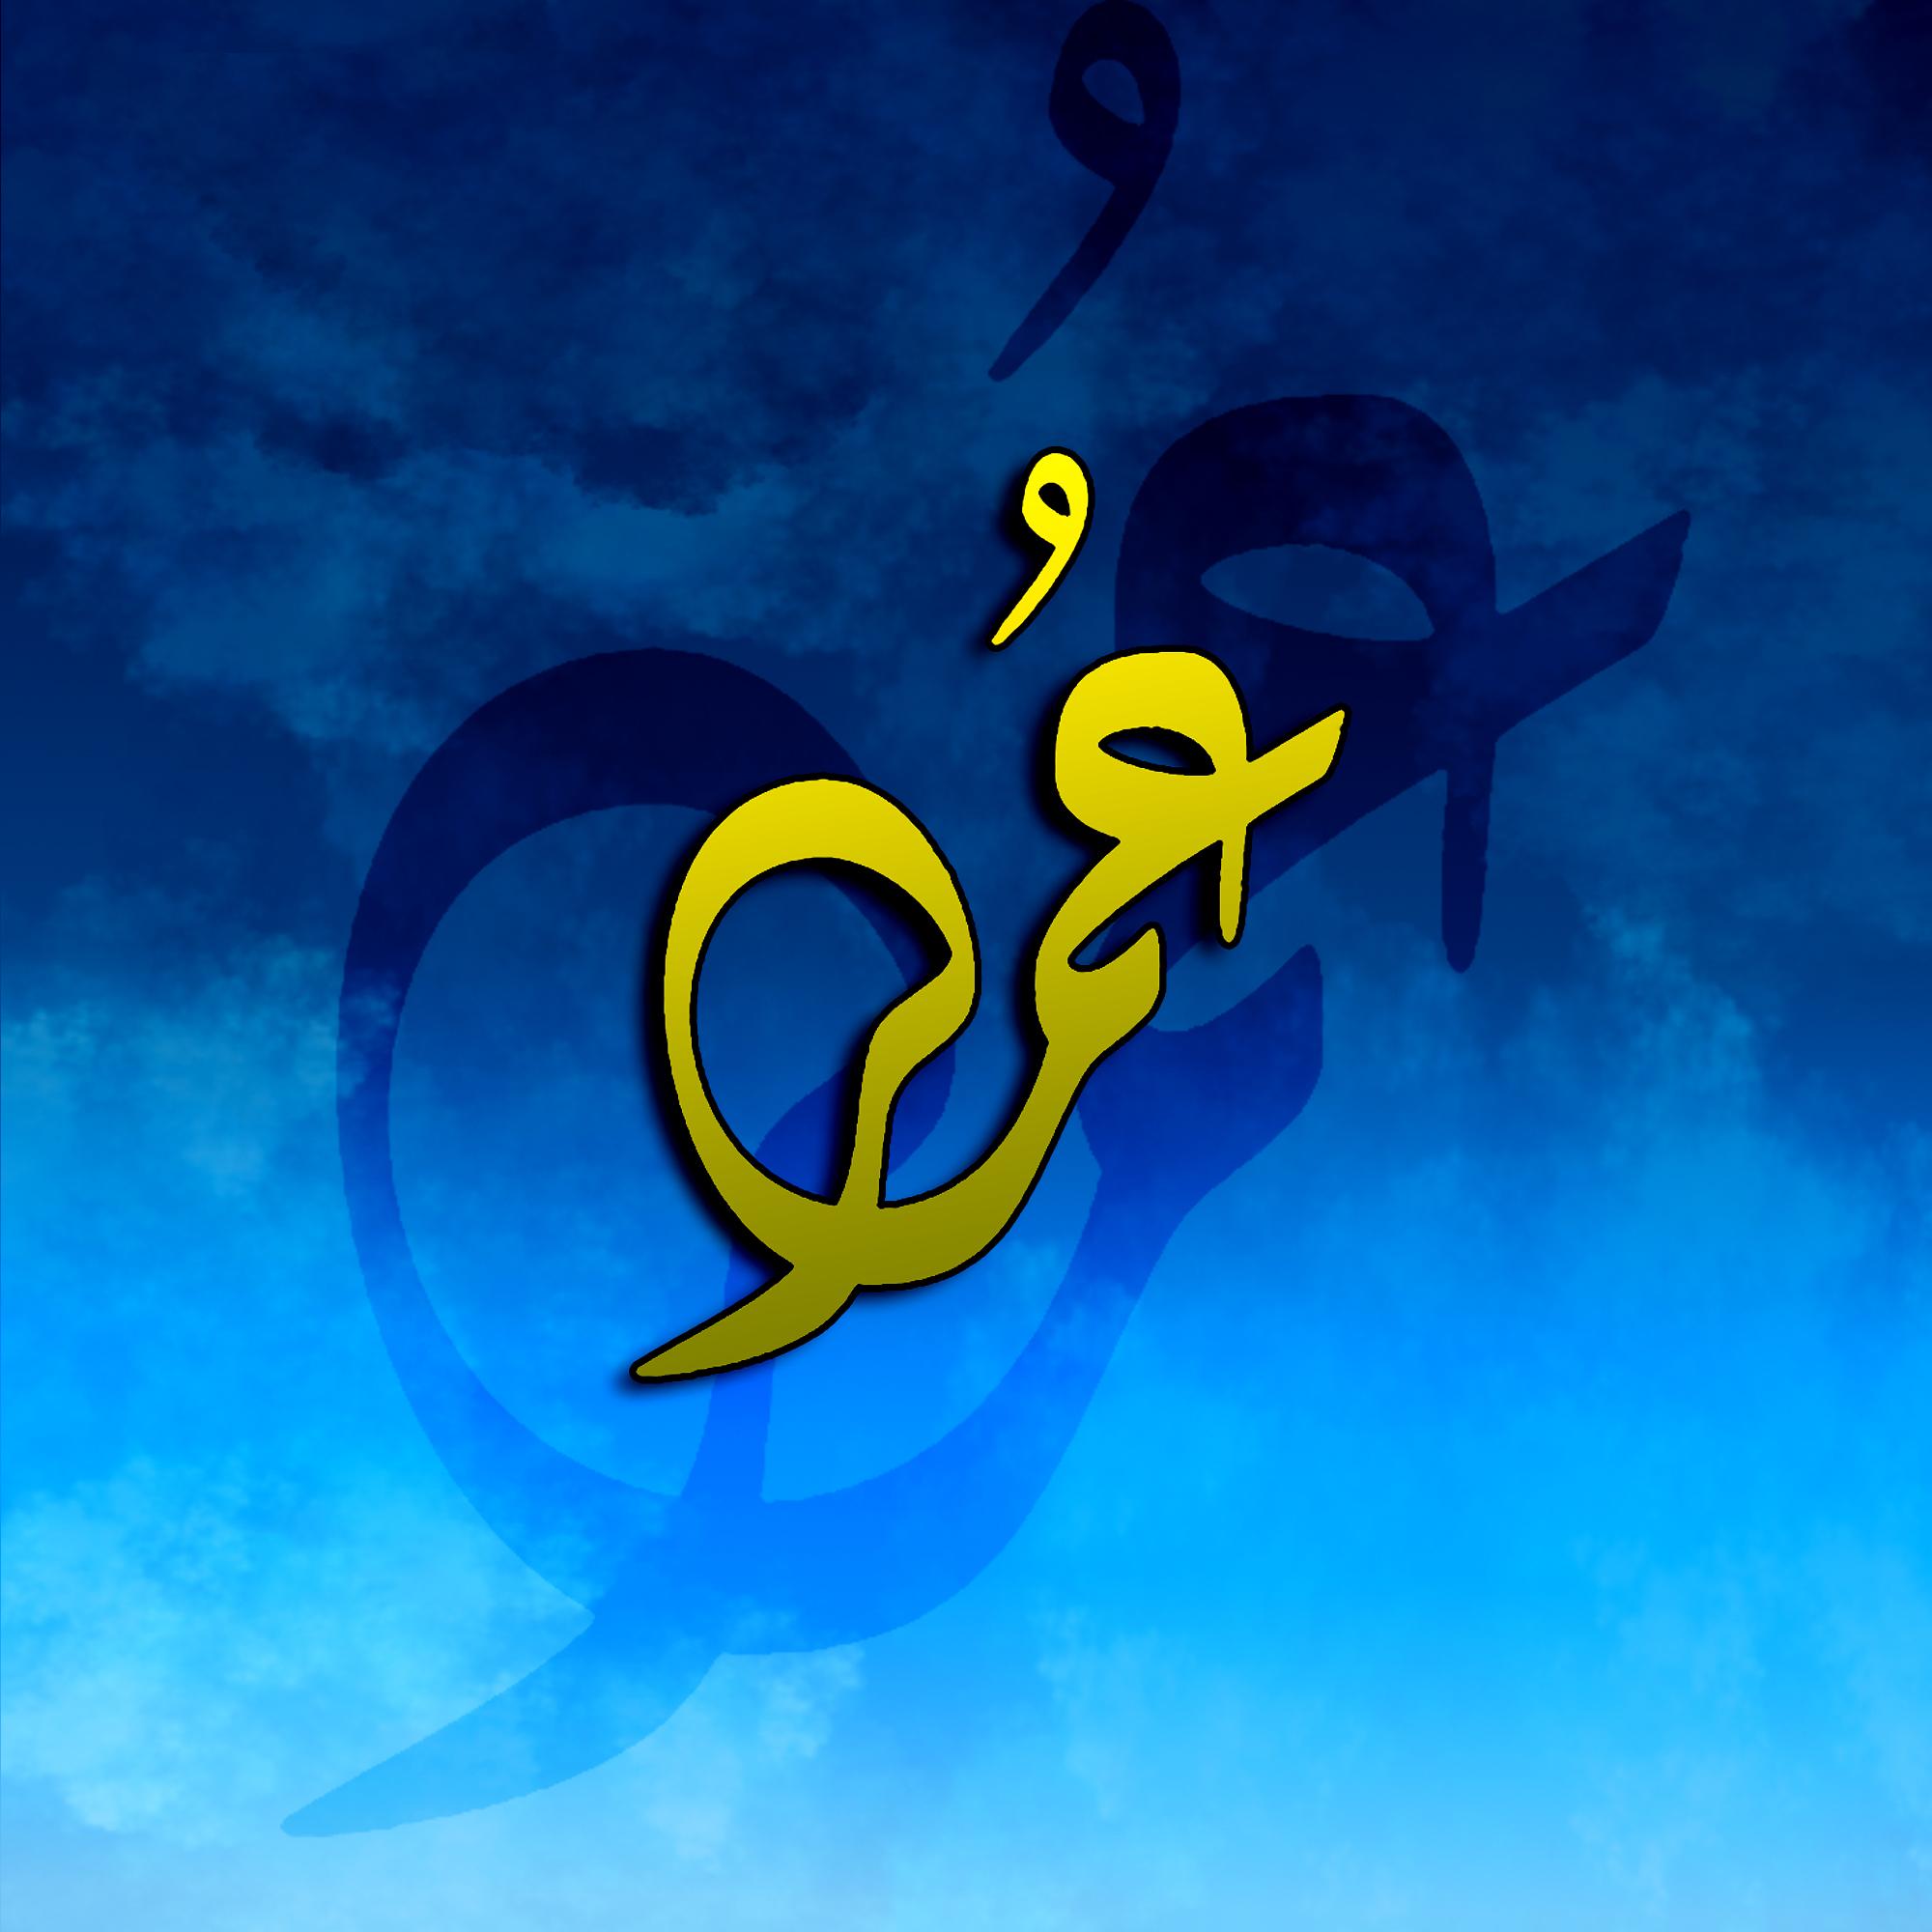 Great Wallpaper Name Arabic - omar_1_by_imsabir-d536ejk  Snapshot_562787.jpg